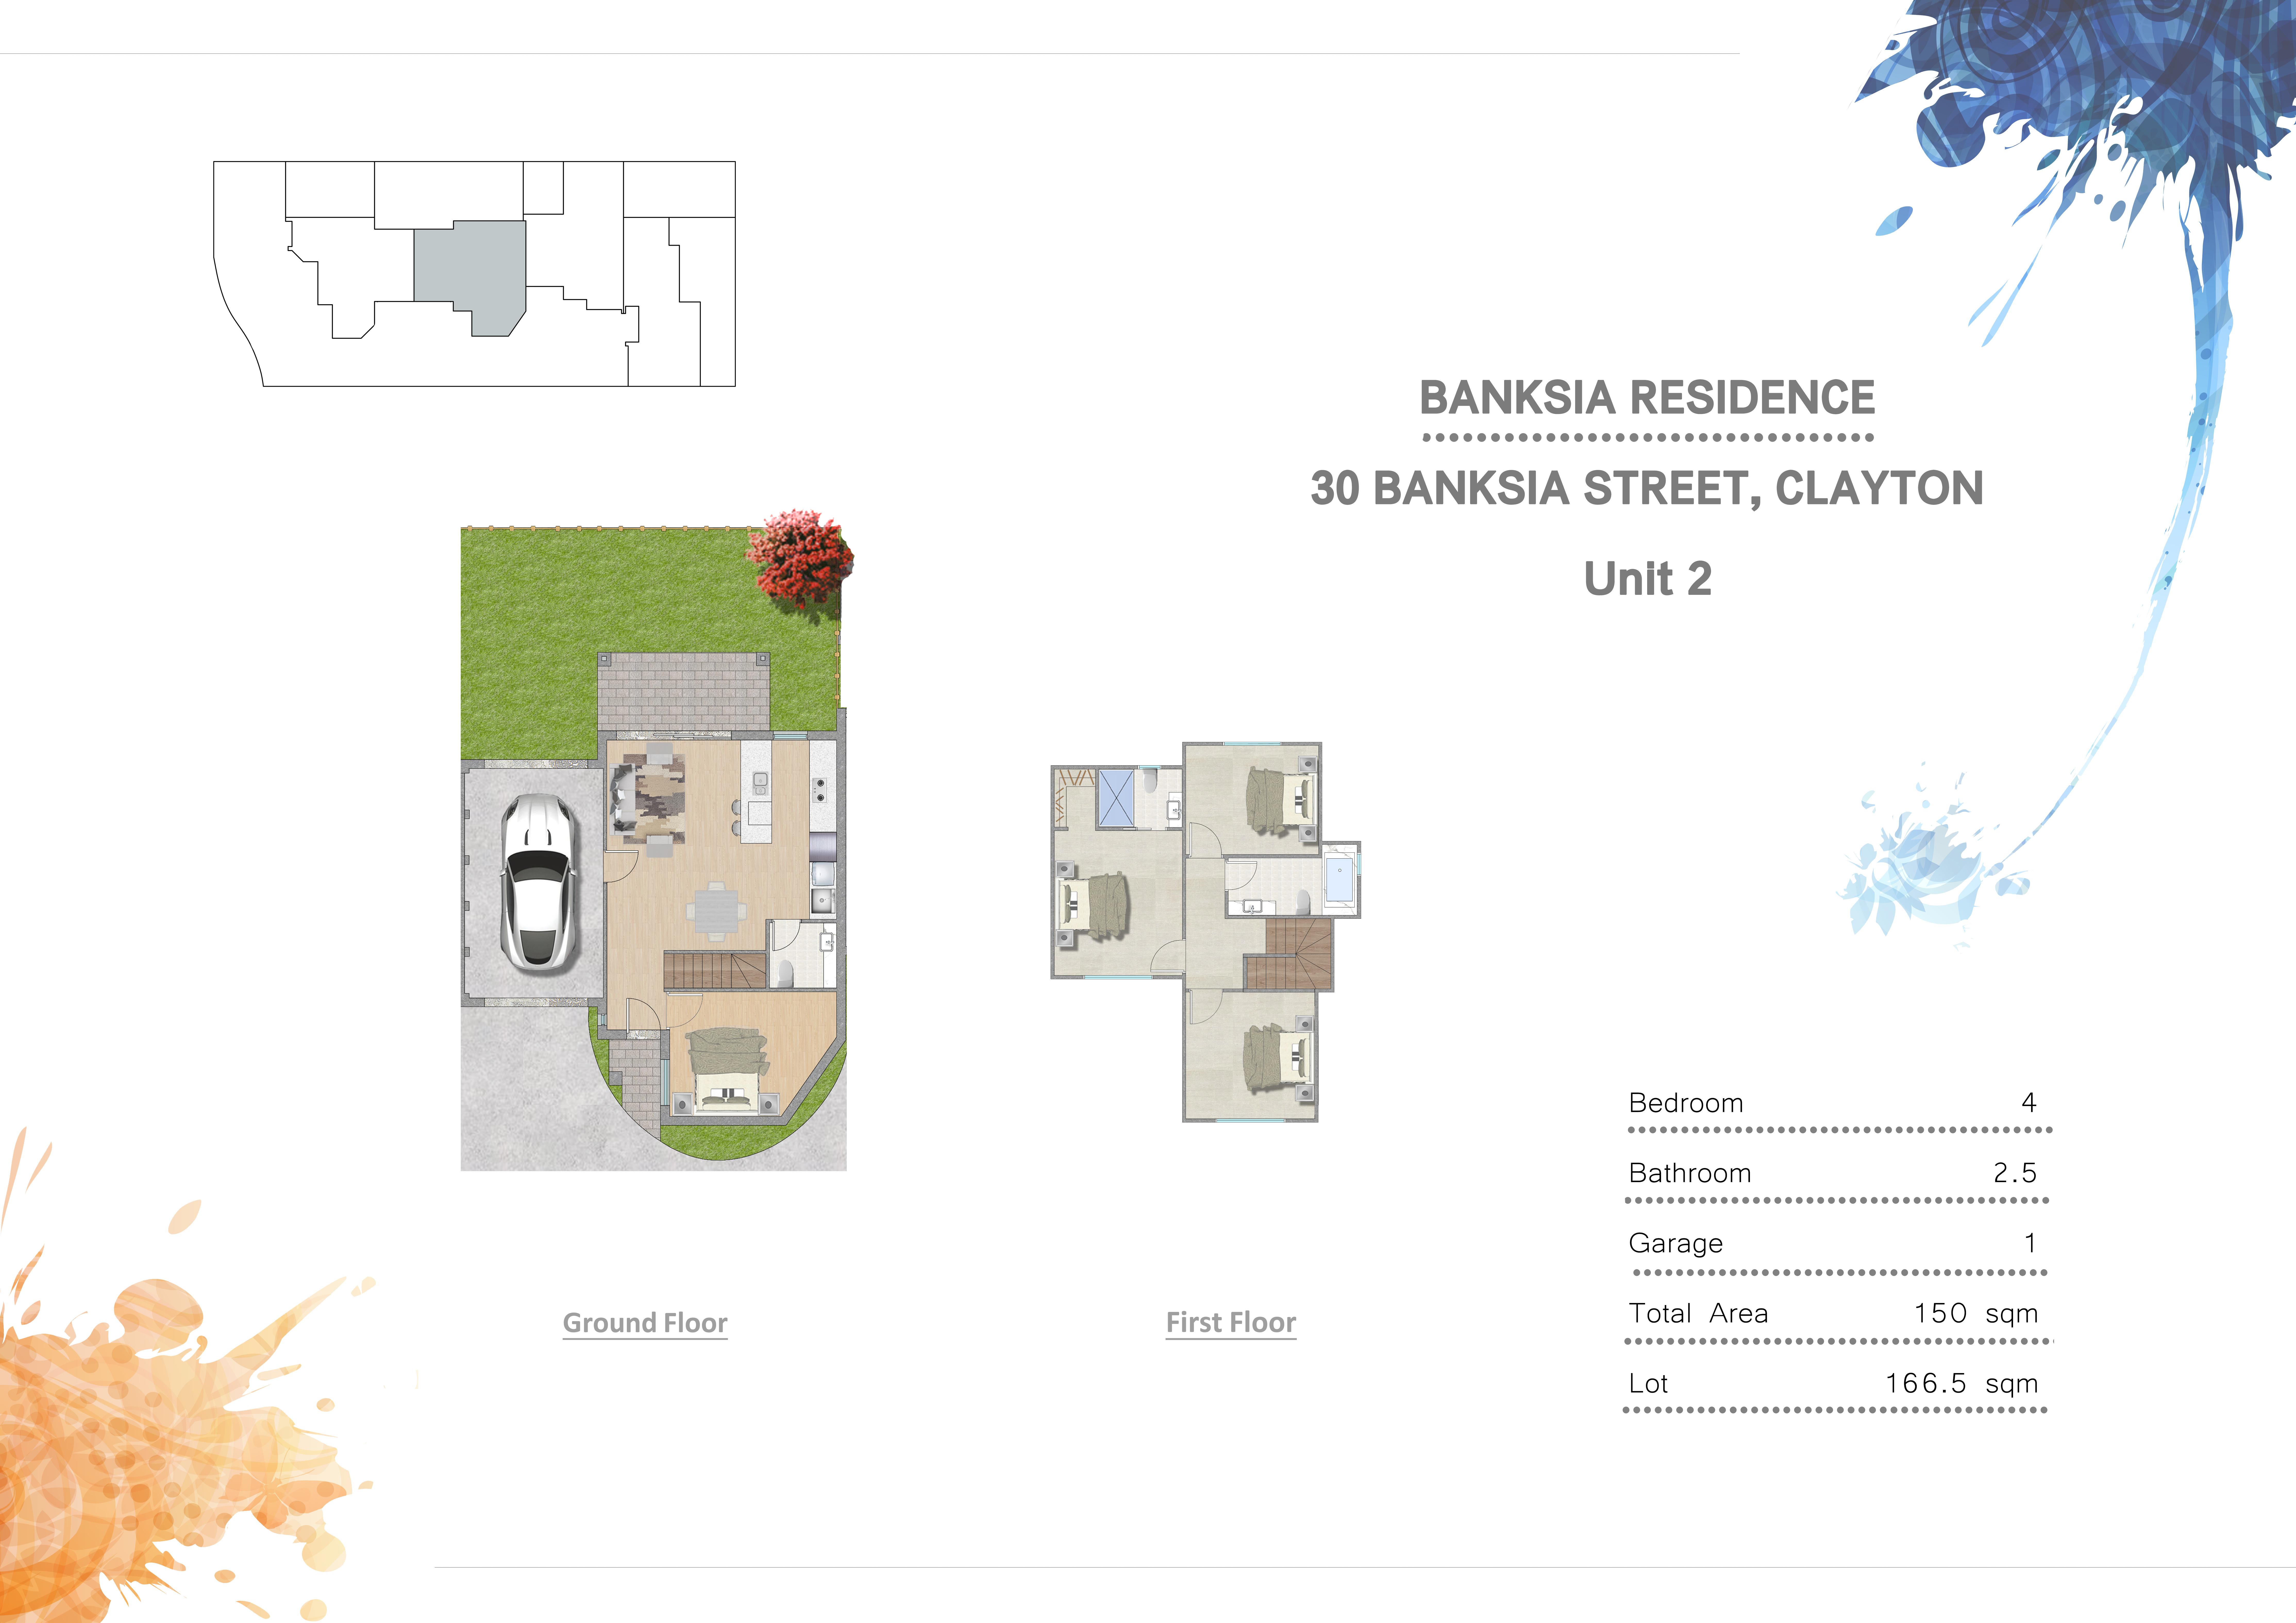 11402_197234_Unit 2 Floor Plan